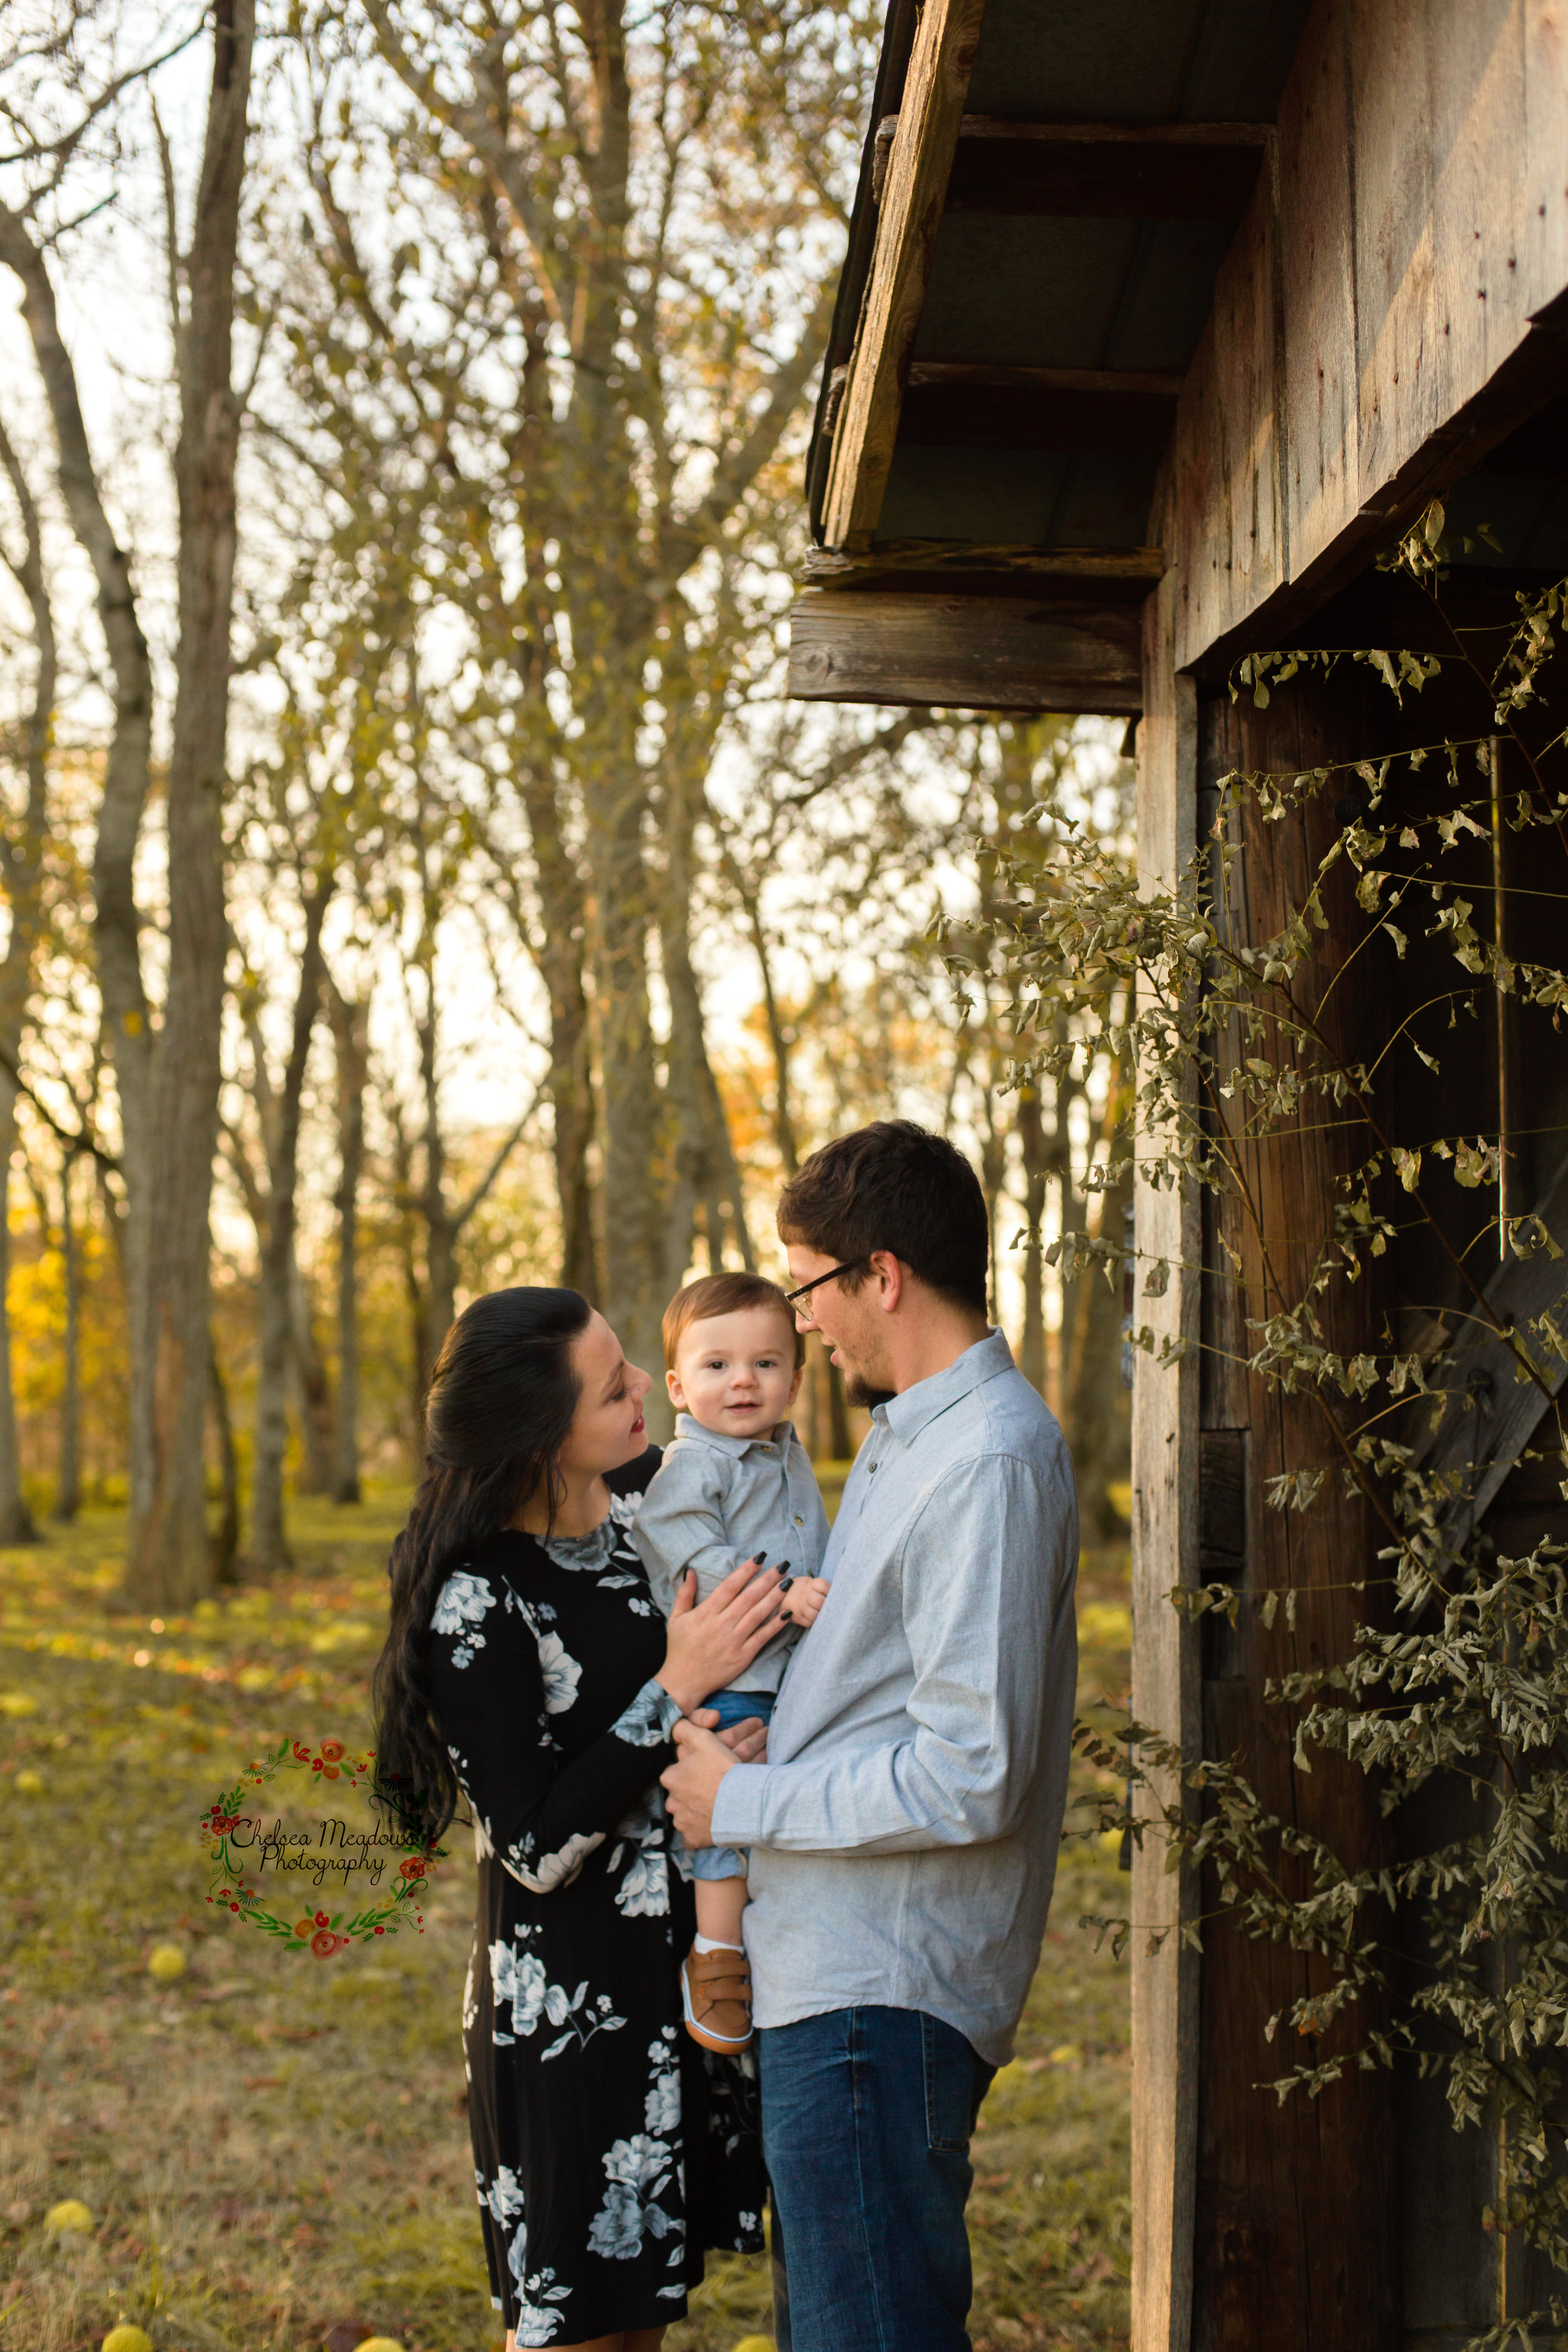 Jessica & Derek Engagement - Nashville Wedding Photographer - Chelsea Meadows Photography (25).jpg